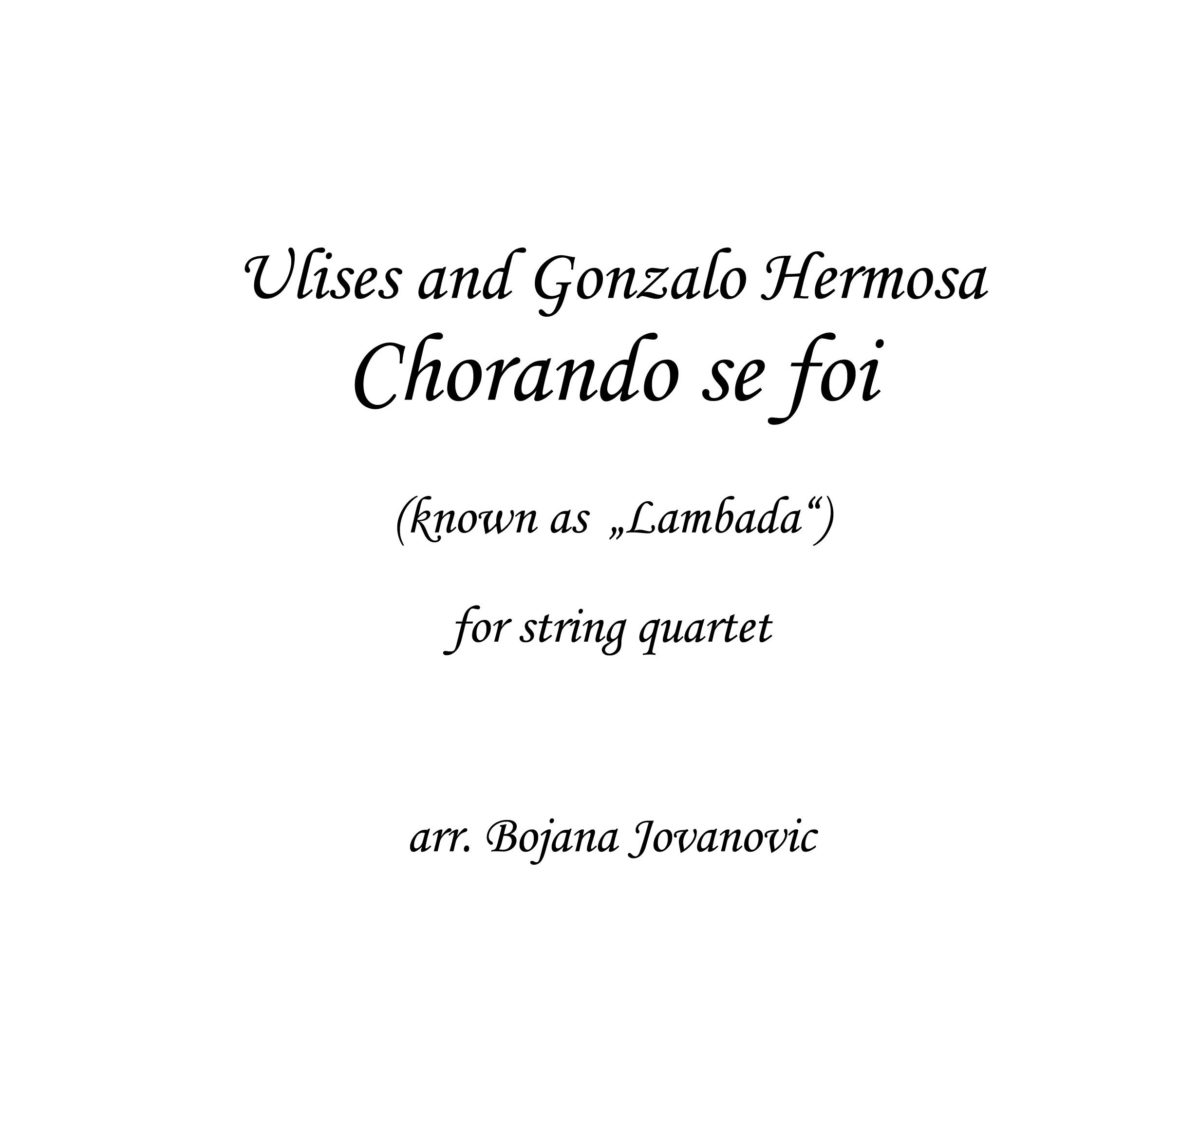 Chorando se foi - Lambada (Kaoma) - Sheet Music